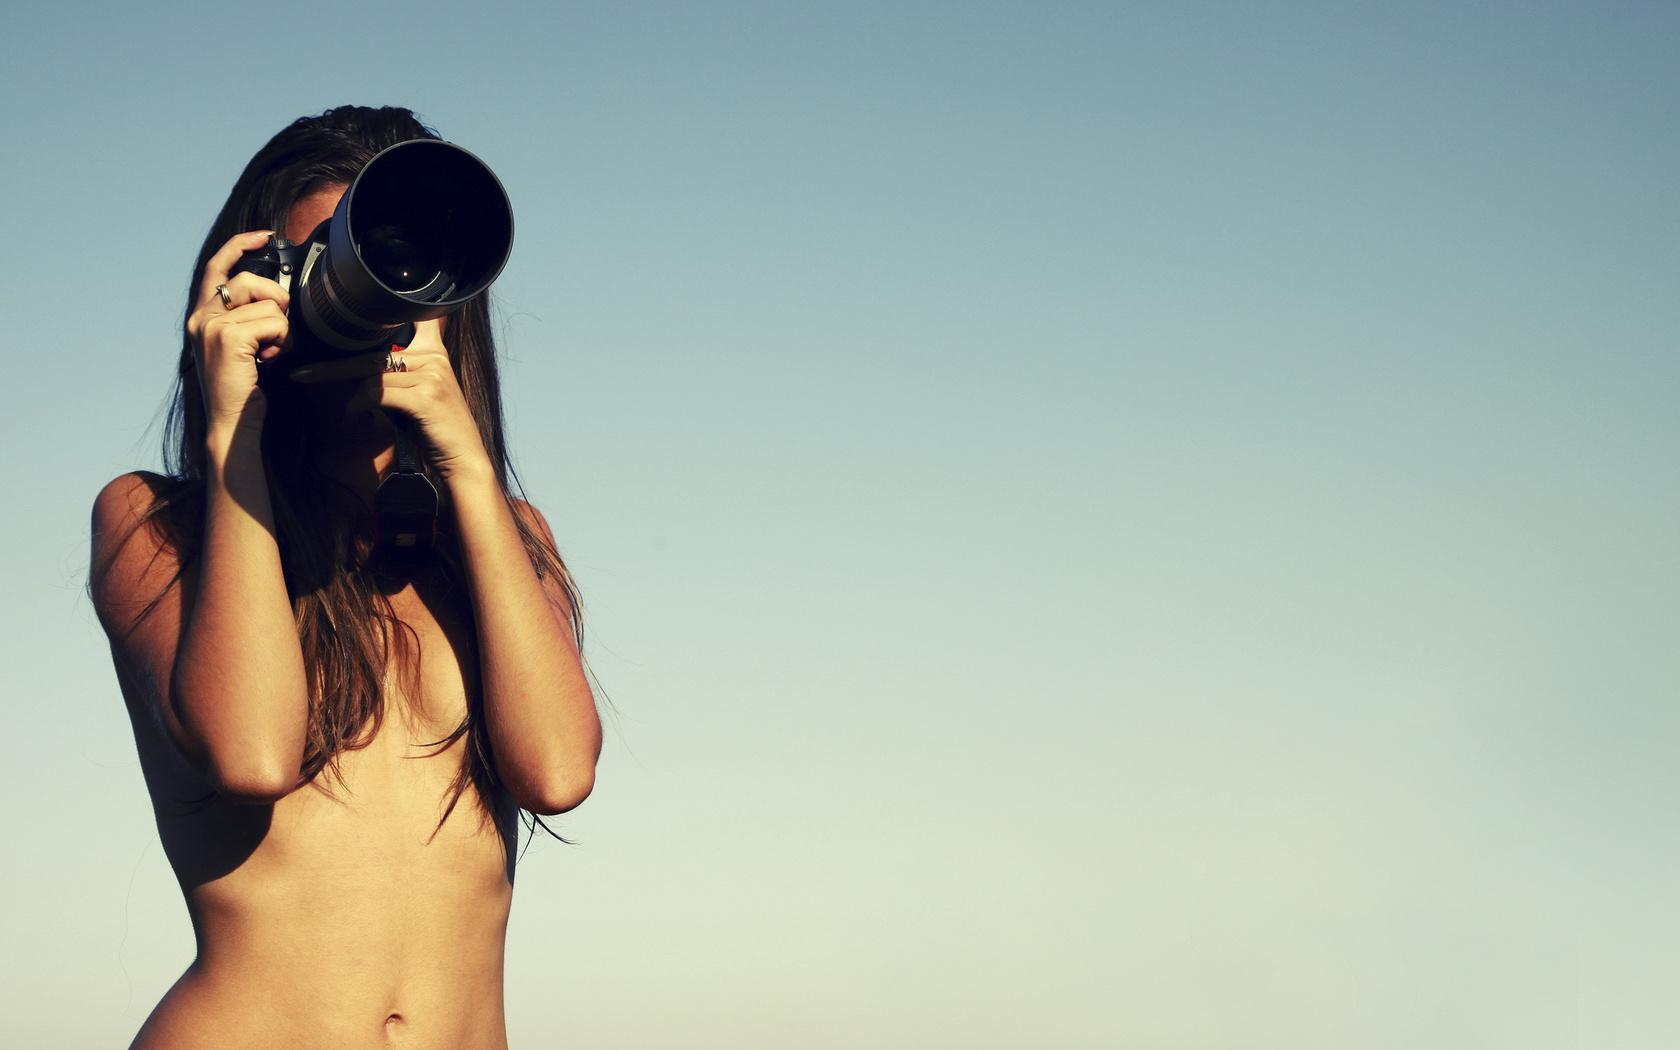 Sexy camera girl